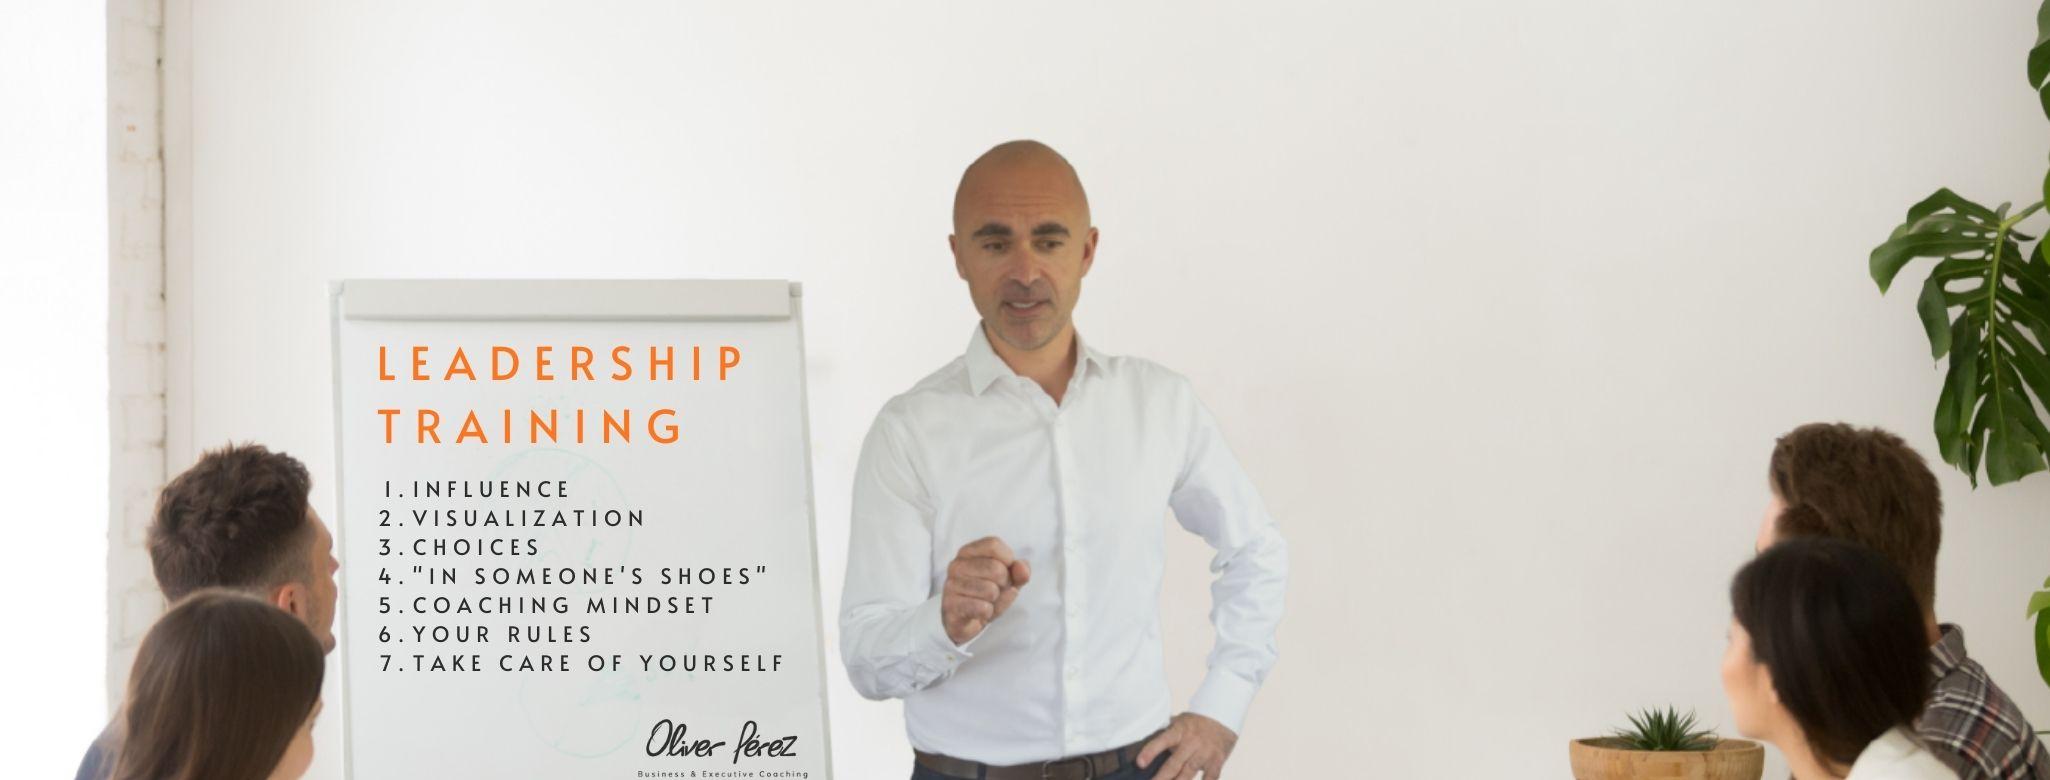 leadership training photo 2